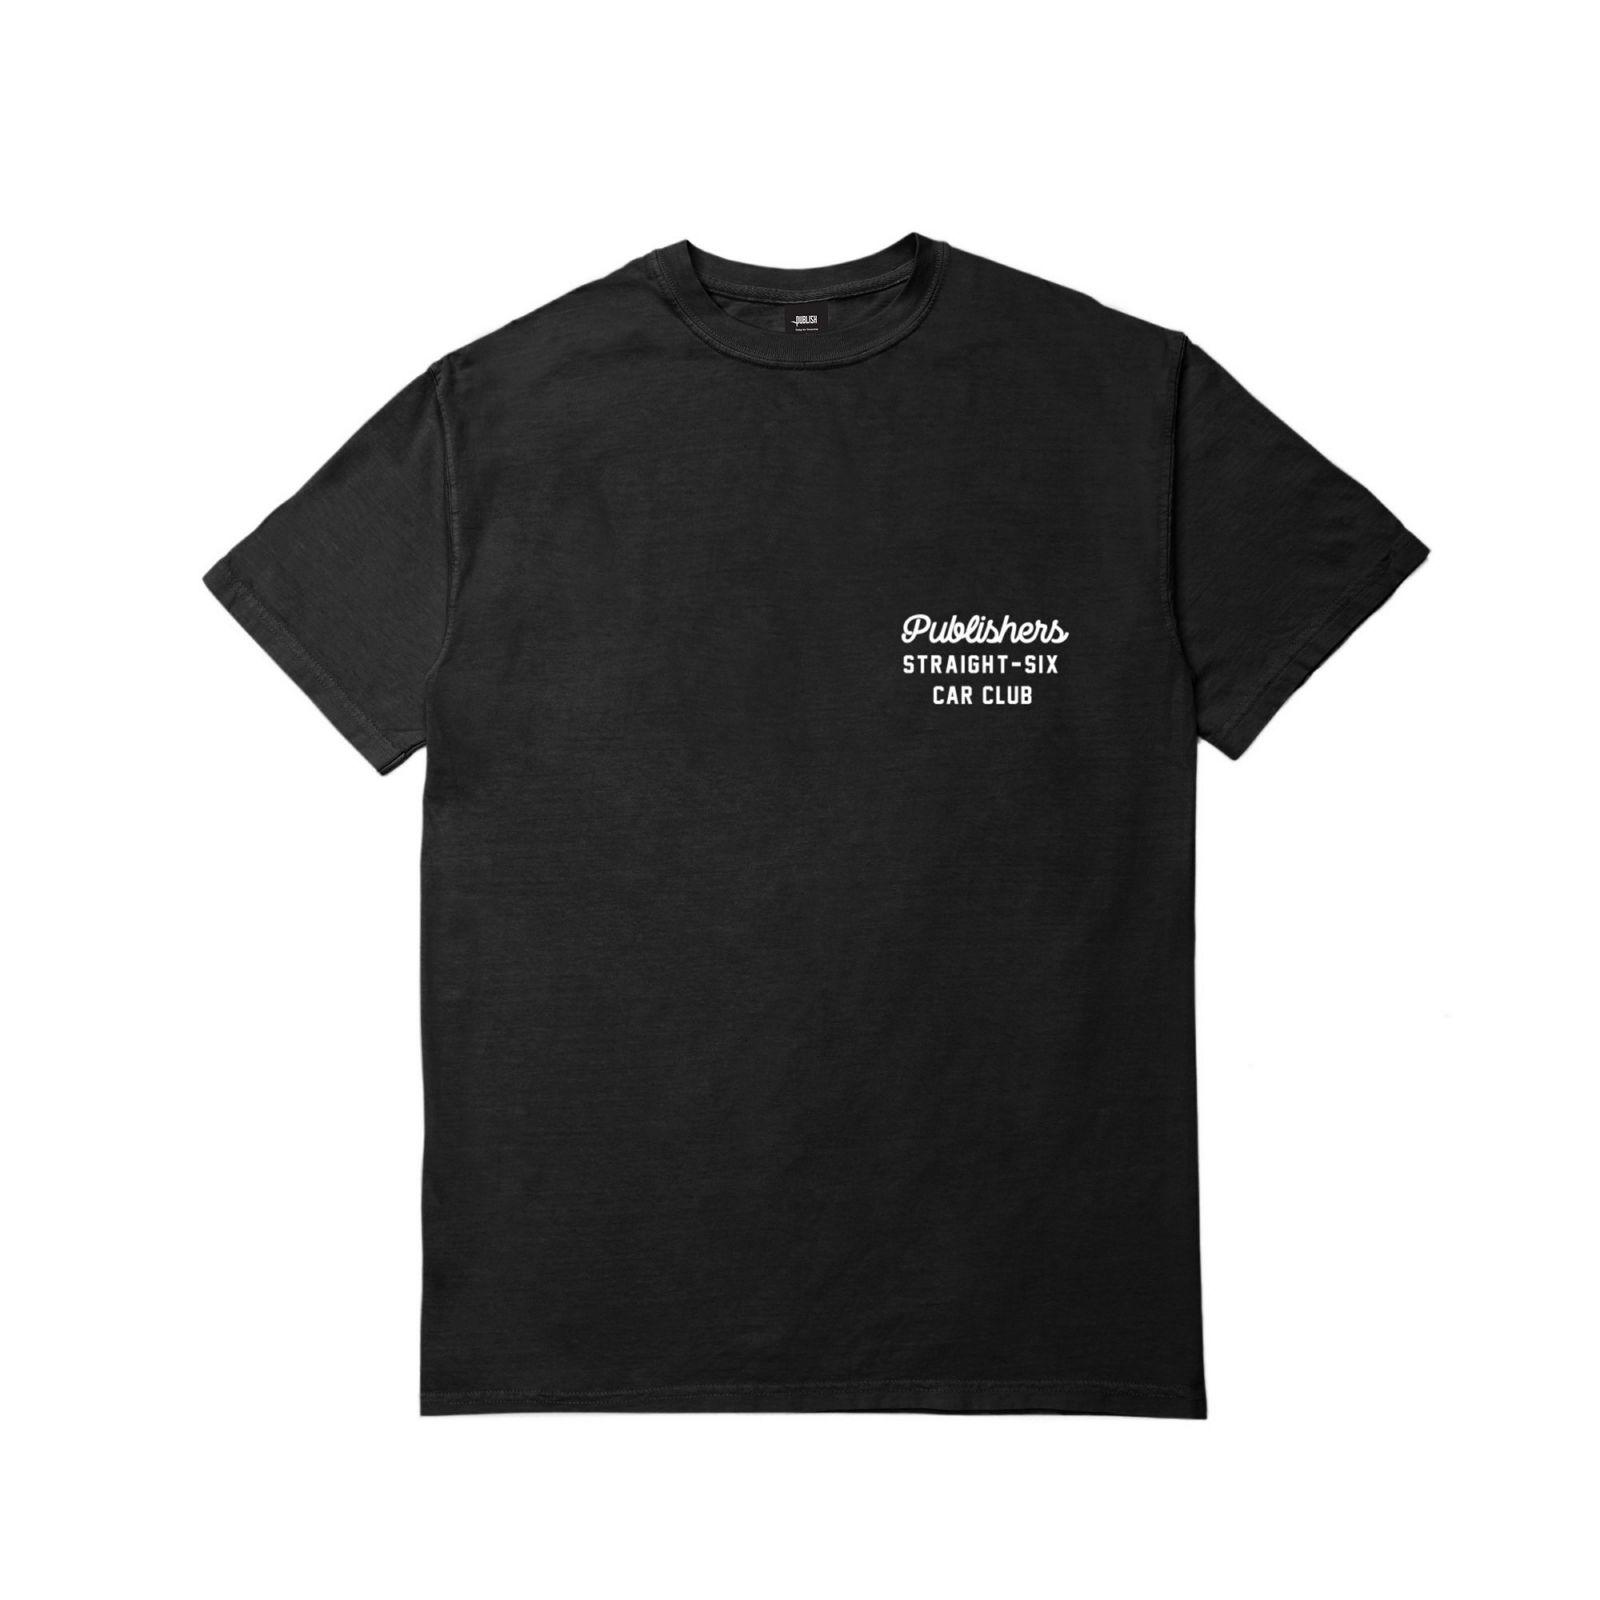 【PUBLISH BRAND/パブリッシュブランド】CAR CLUB Tシャツ / BLACK